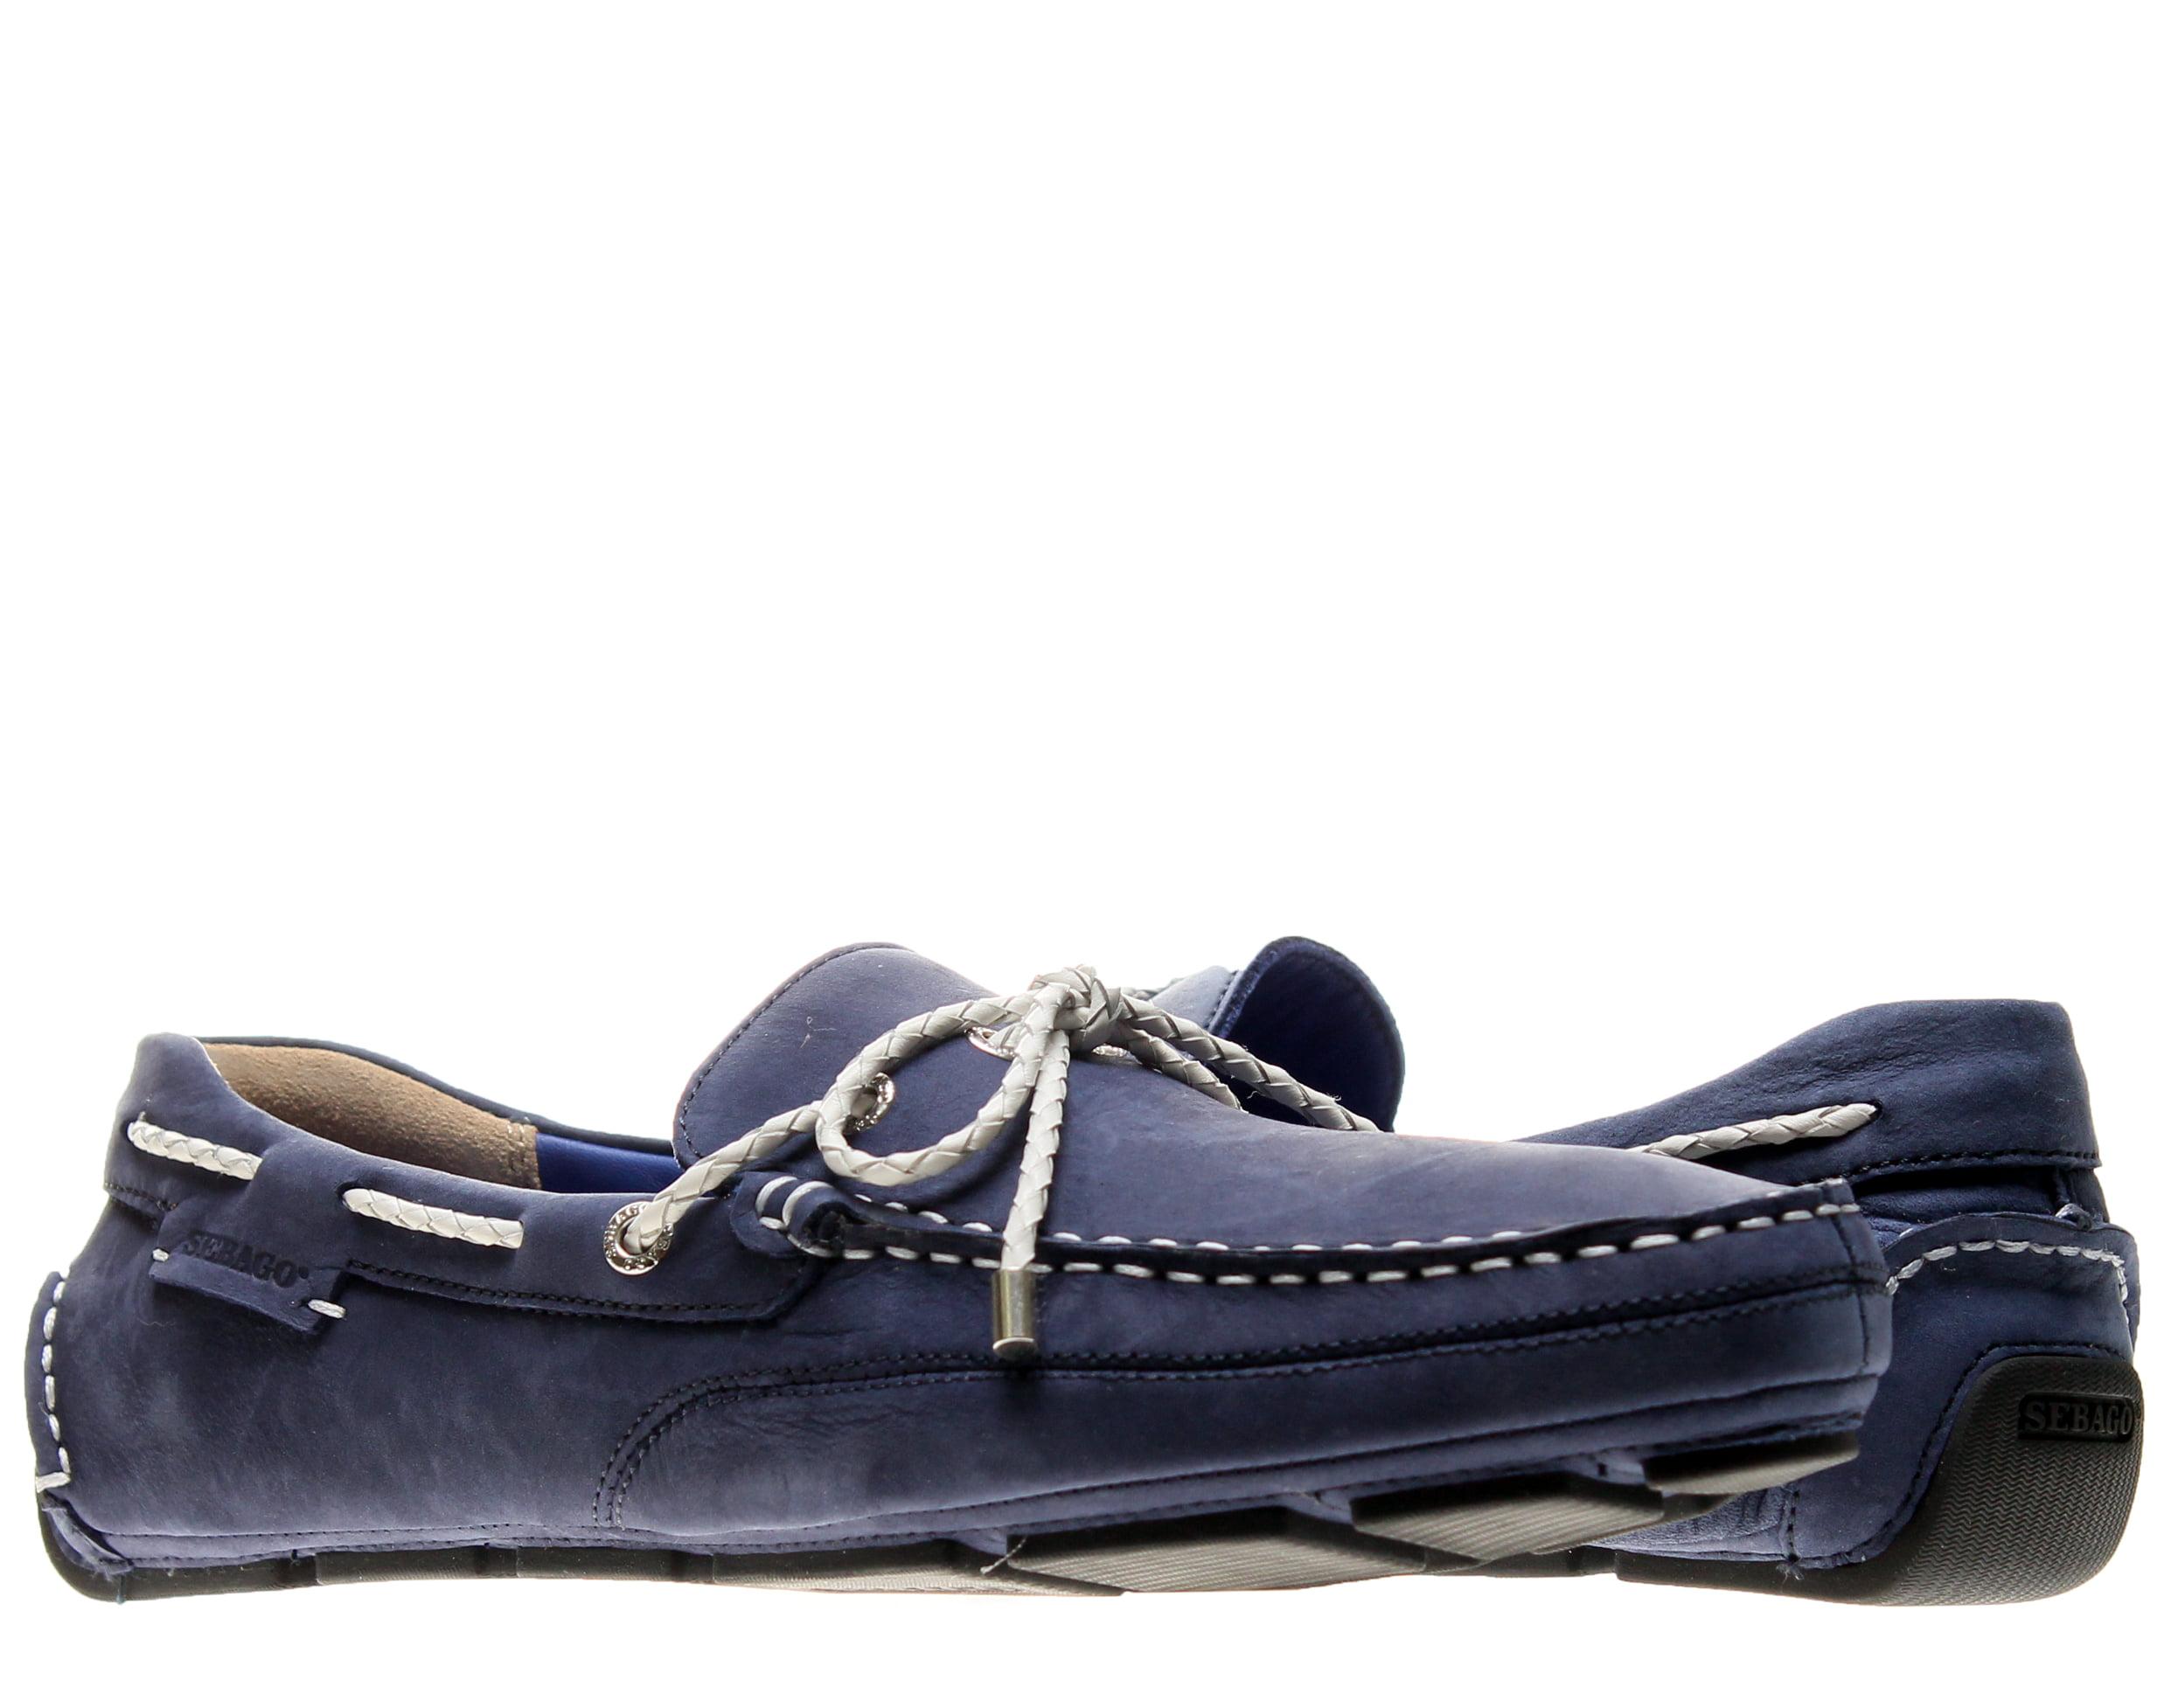 Sebago Kedge Tie Navy Nubuck Men's Boat Shoes B810108 by Sebago